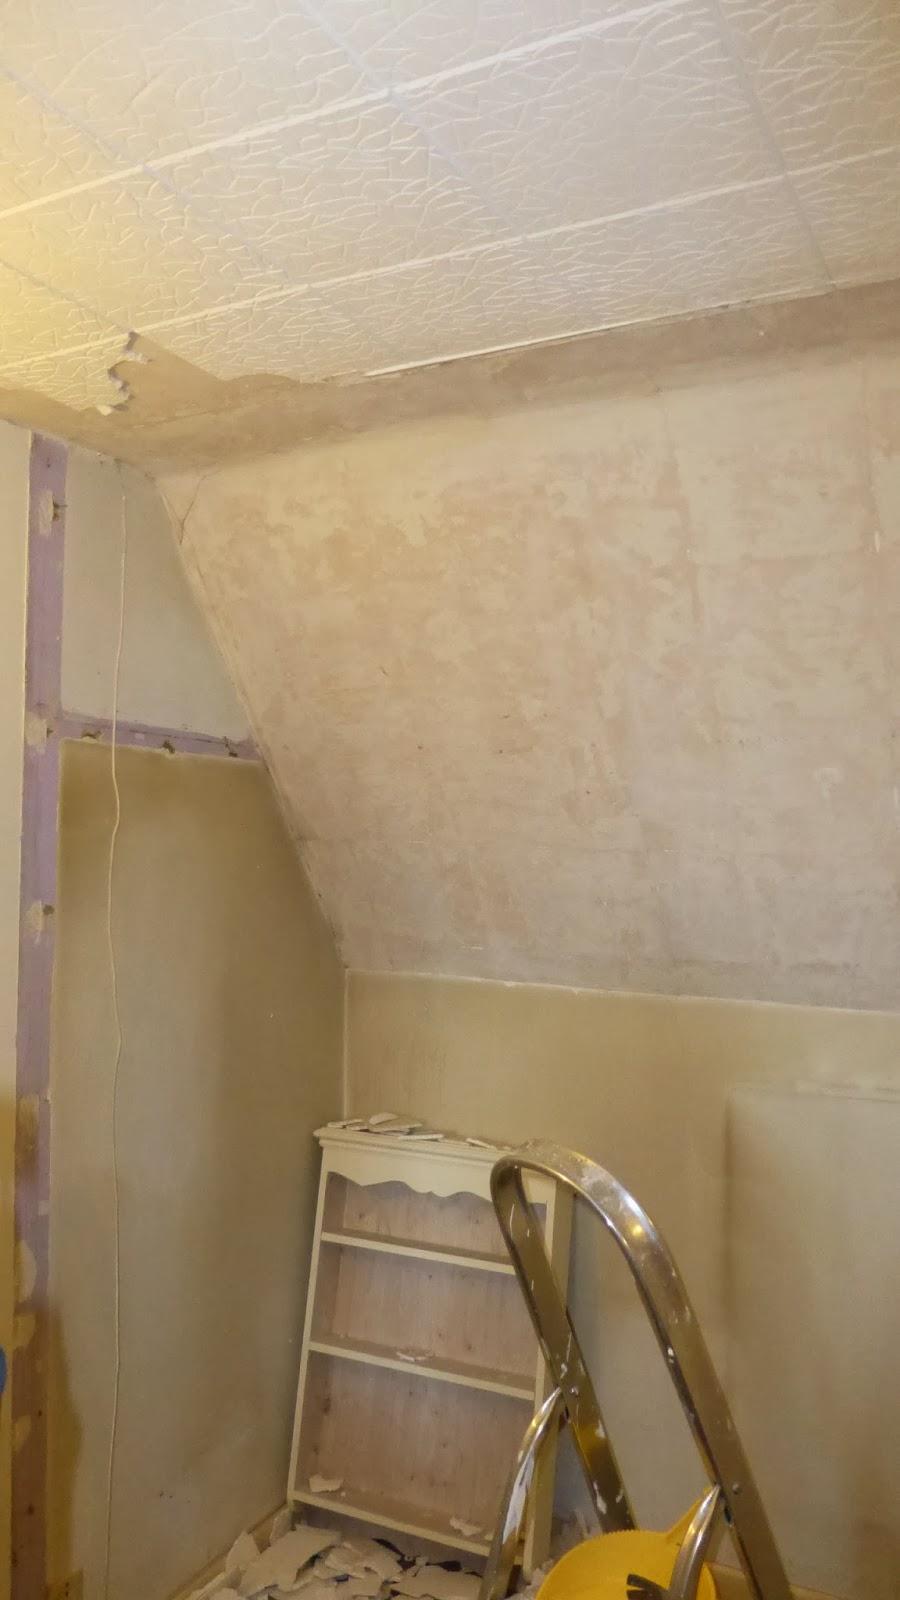 Remove glue on polystyrene ceiling tiles energywarden remove glue on polystyrene ceiling tiles www energywarden net dailygadgetfo Images